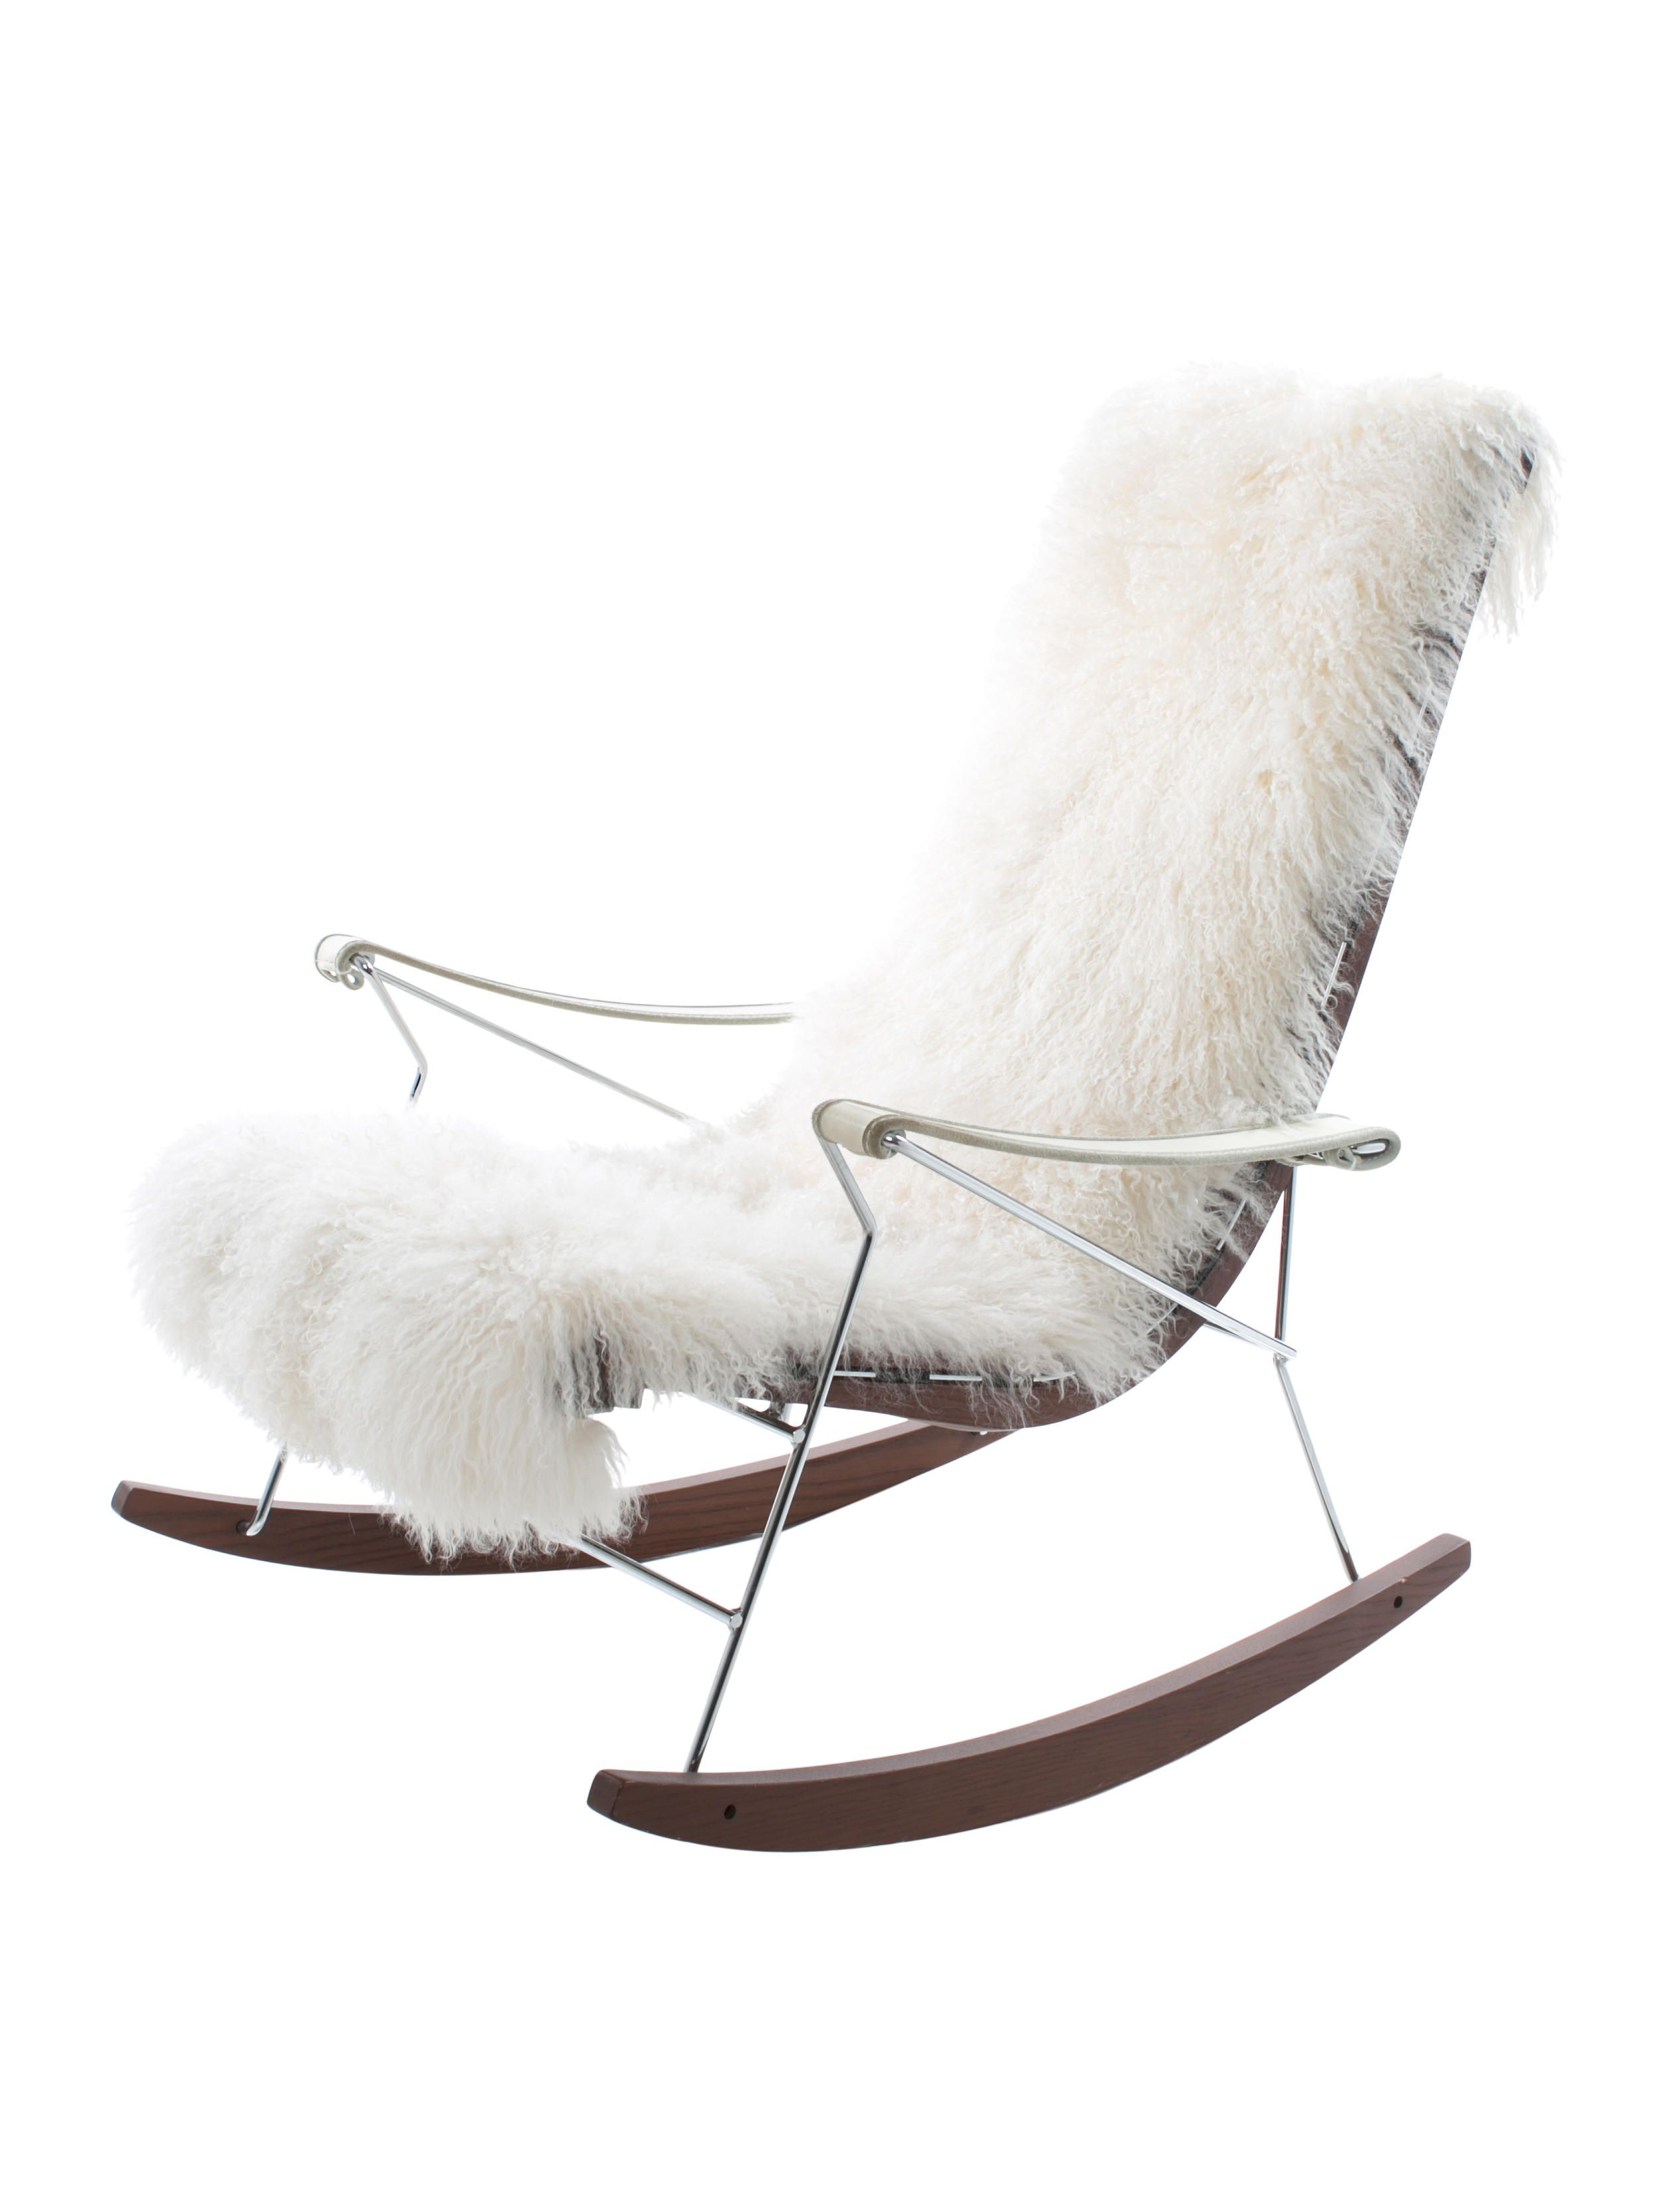 Marvelous J J Rocking Chair Little Ones Rocking Chair Bb Italia Inzonedesignstudio Interior Chair Design Inzonedesignstudiocom